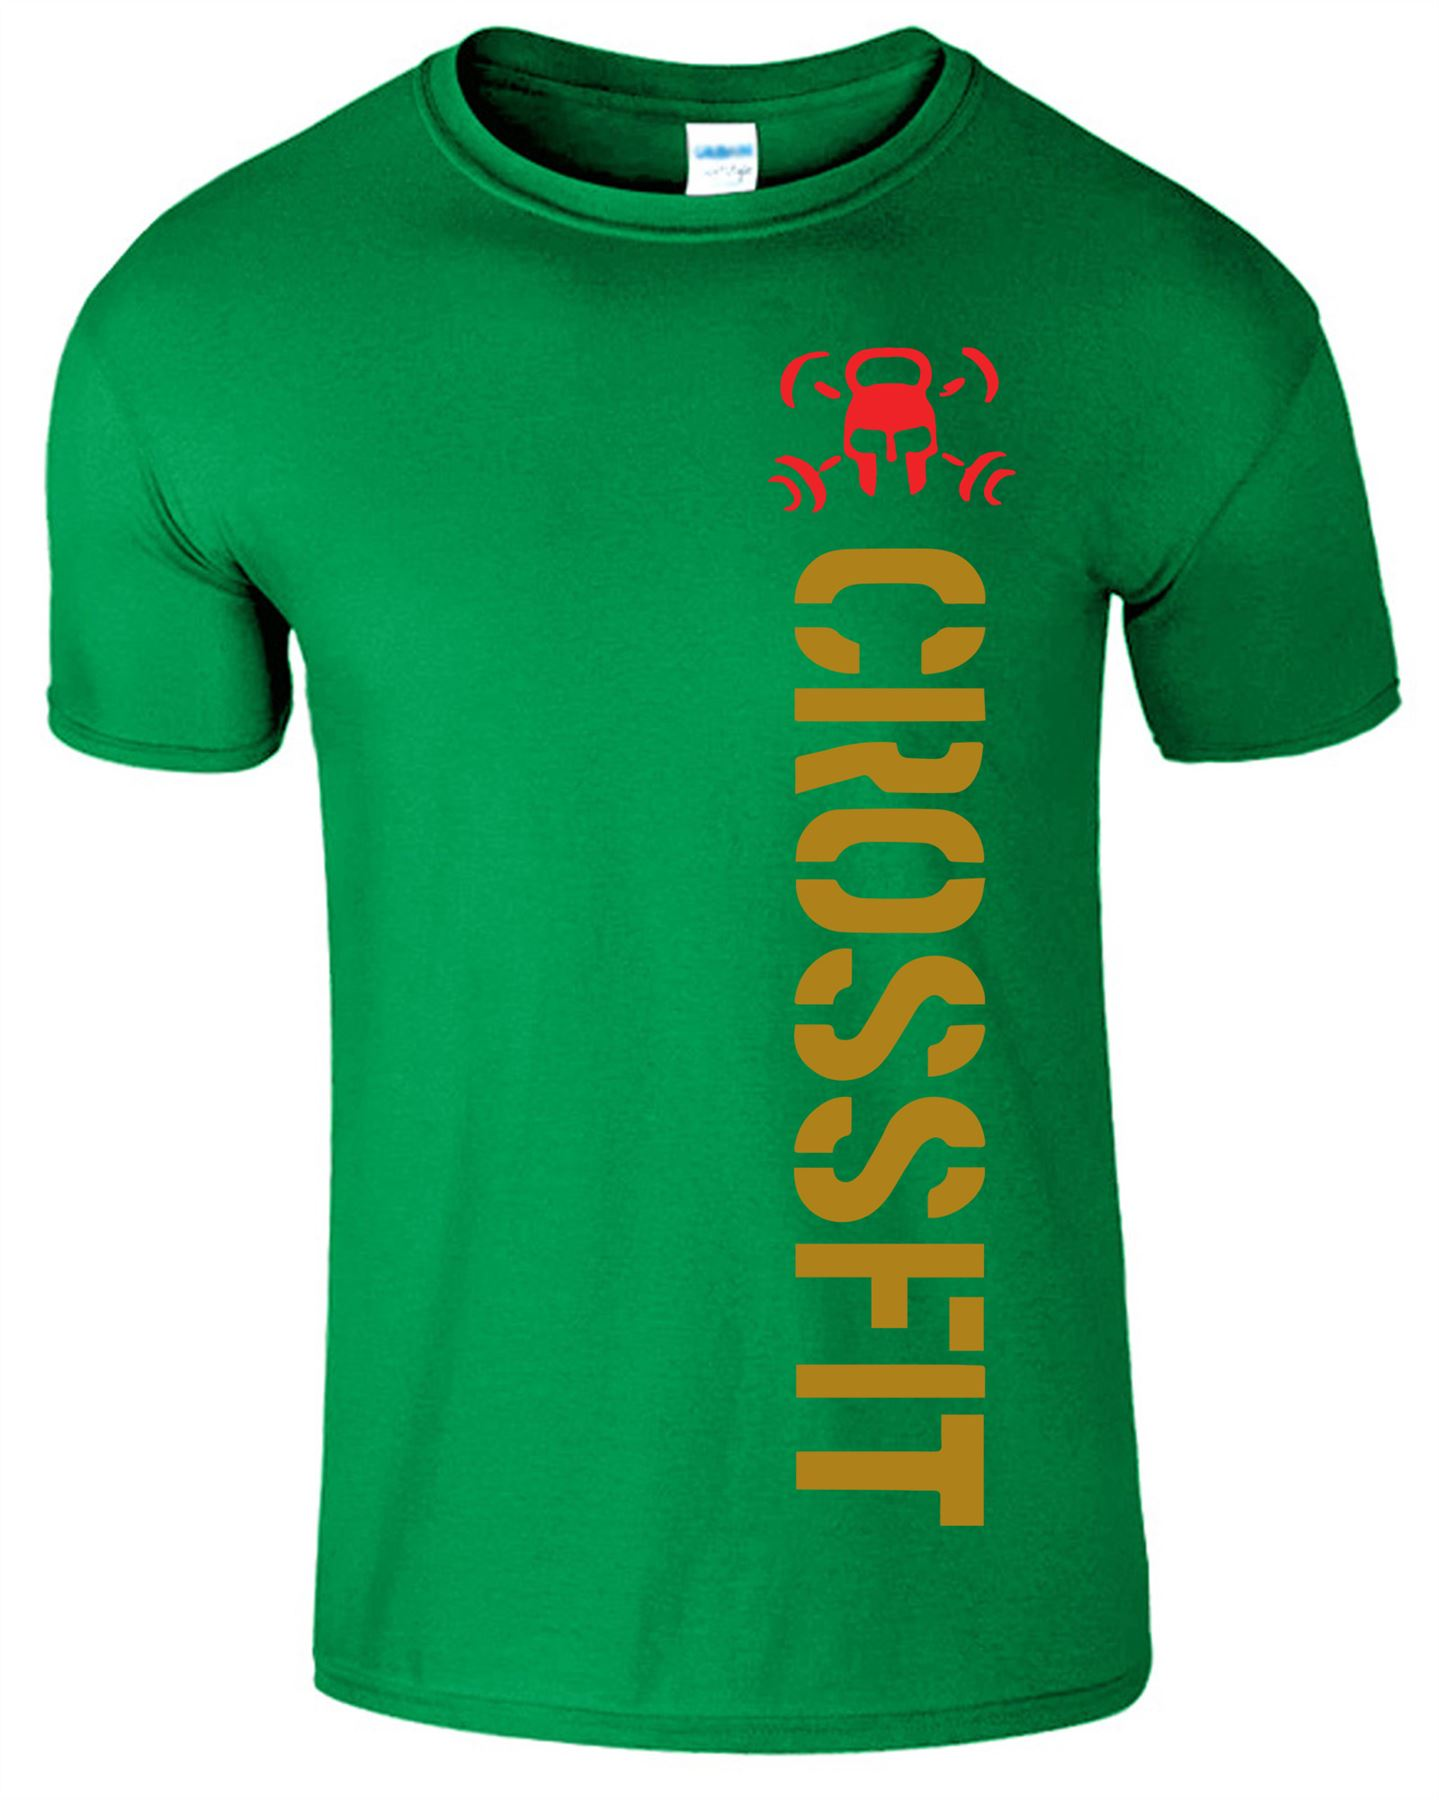 Crossfit-Mens-T-Shirt-Gym-Wear-Bodybuilding-Training-Workout-Fitness-T-Shirt Indexbild 12